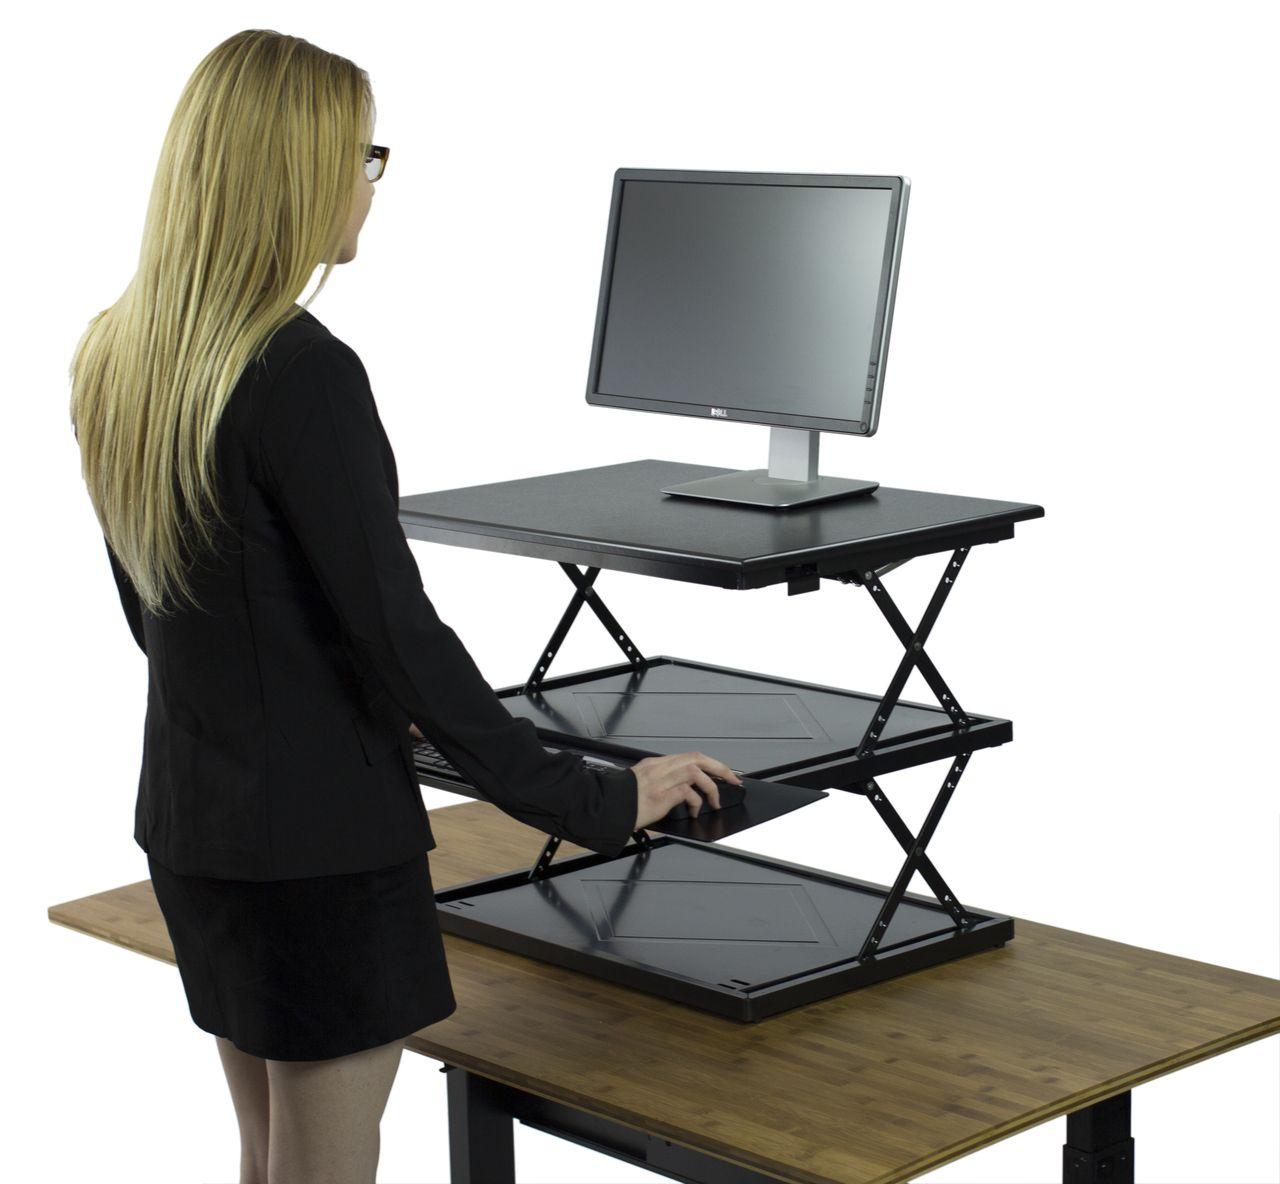 Adjustable Height Standing Desk Conversion